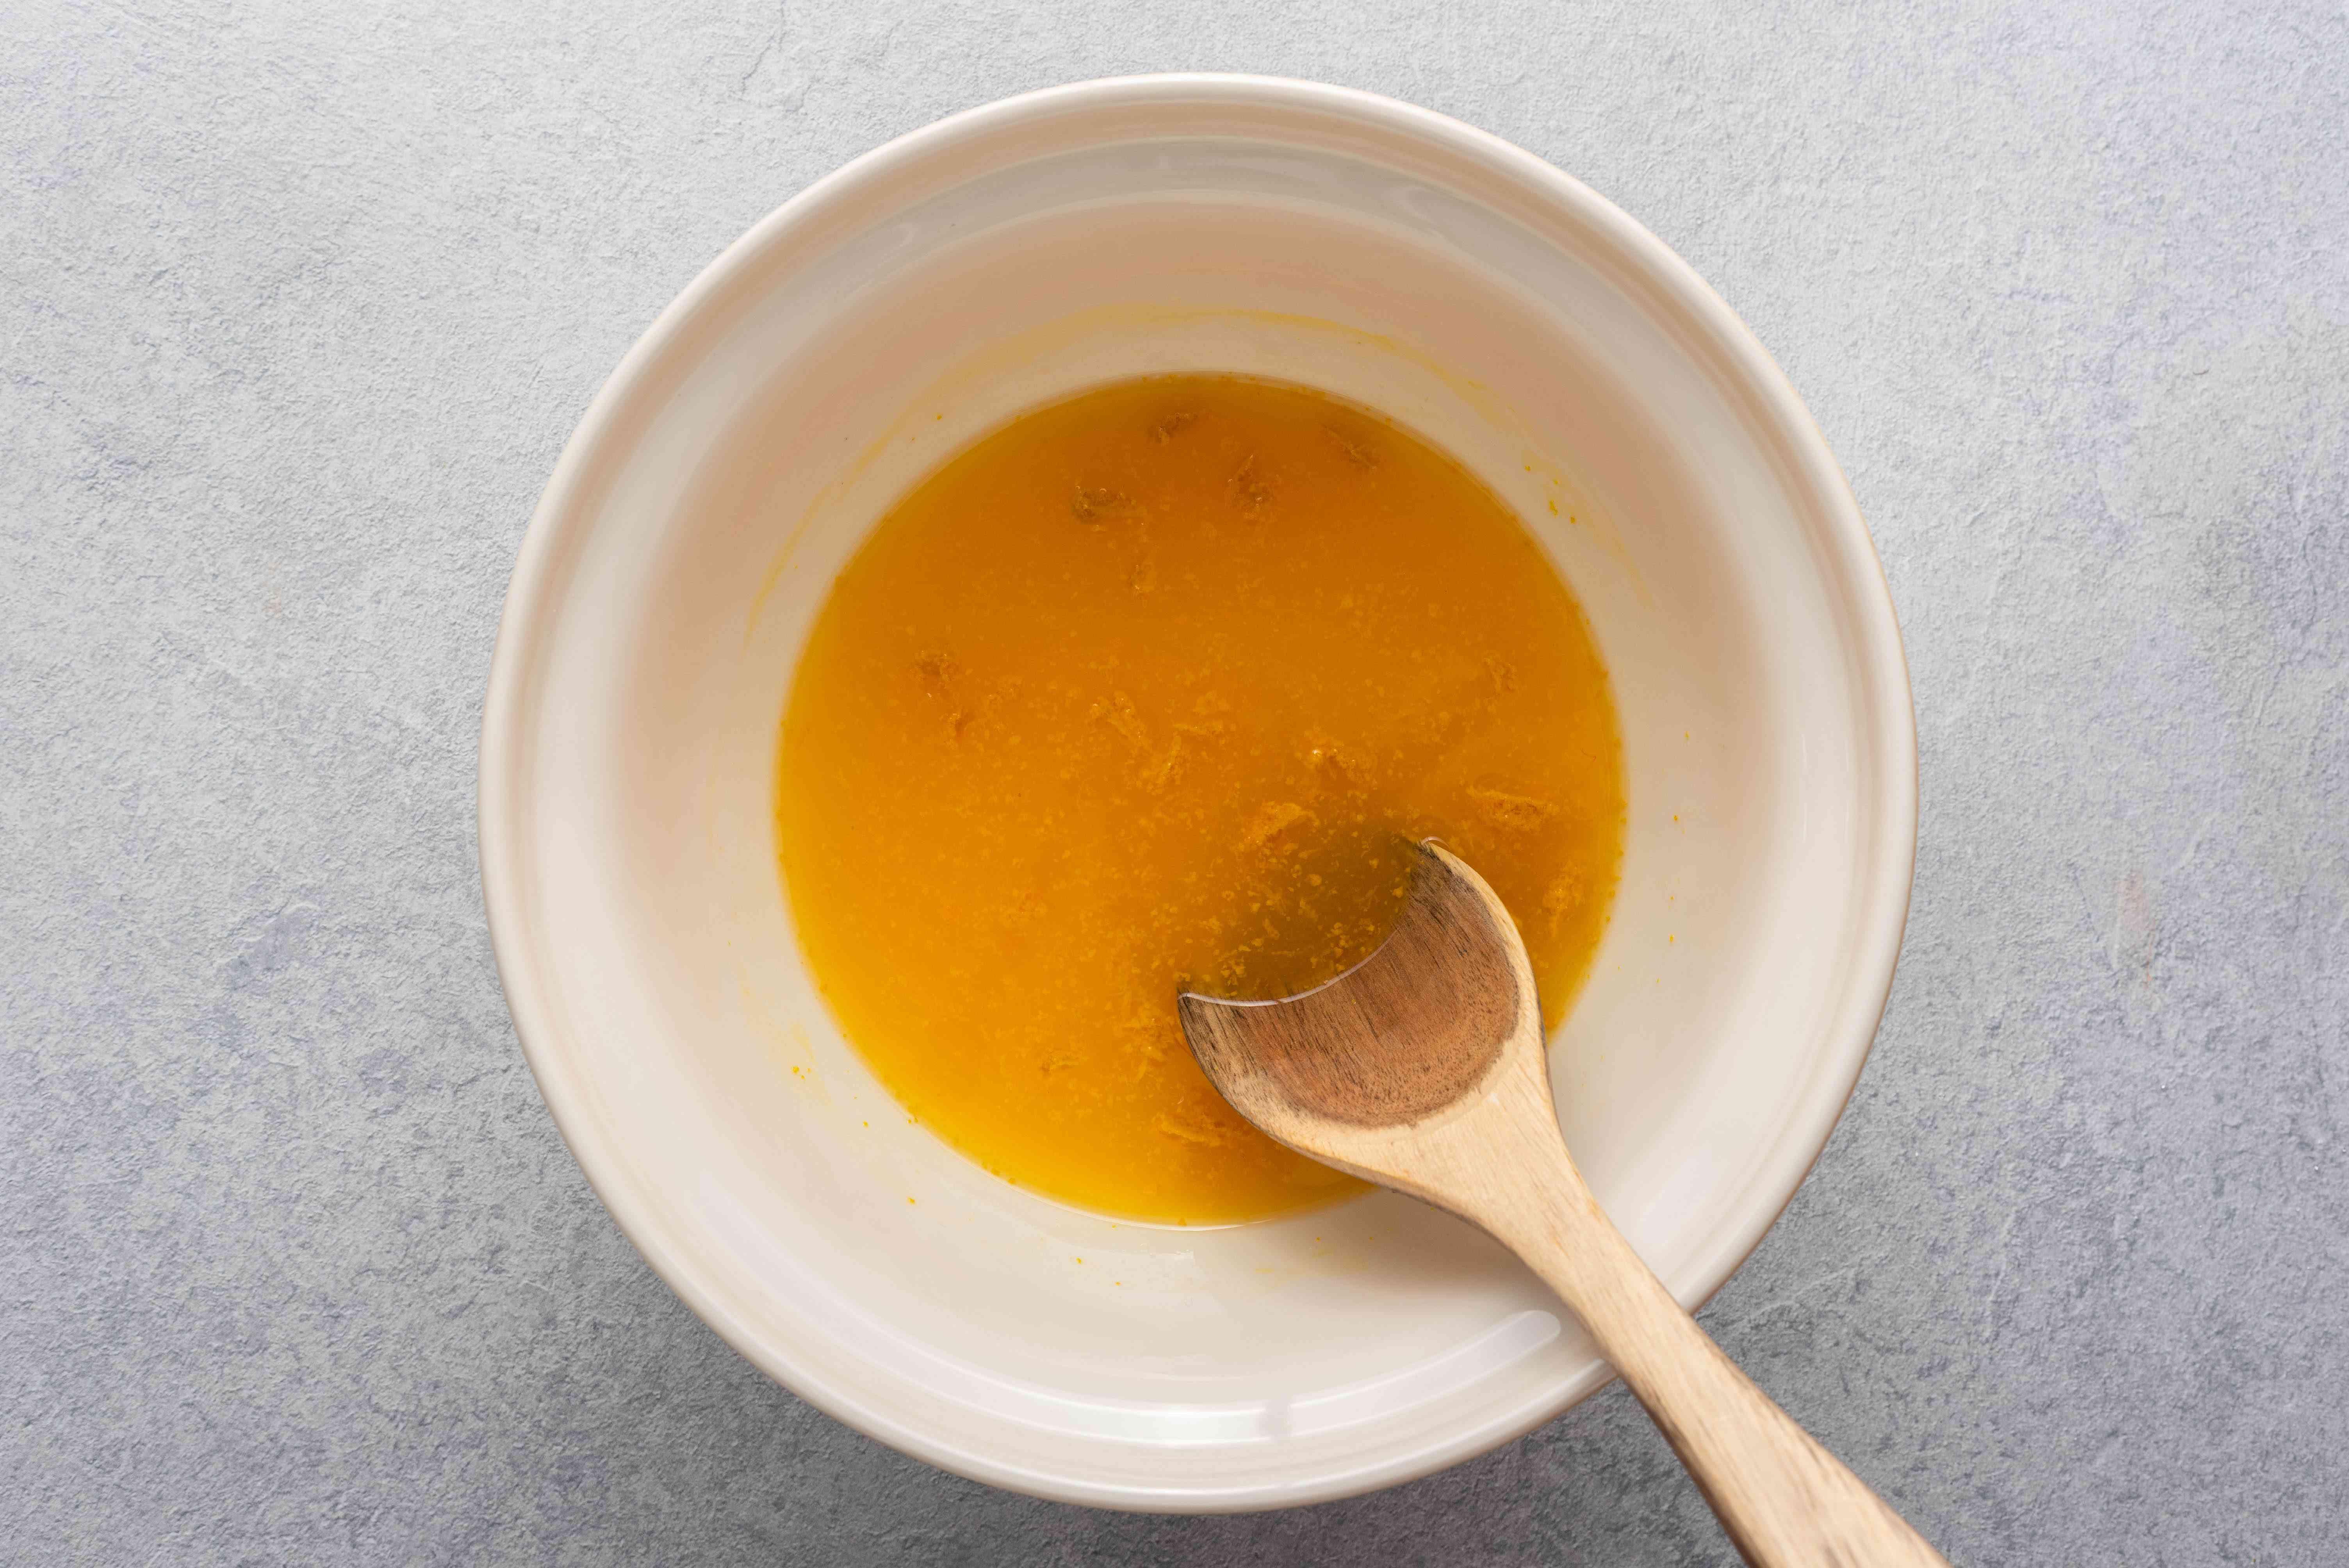 Orange juice, zest, and sugar in a bowl